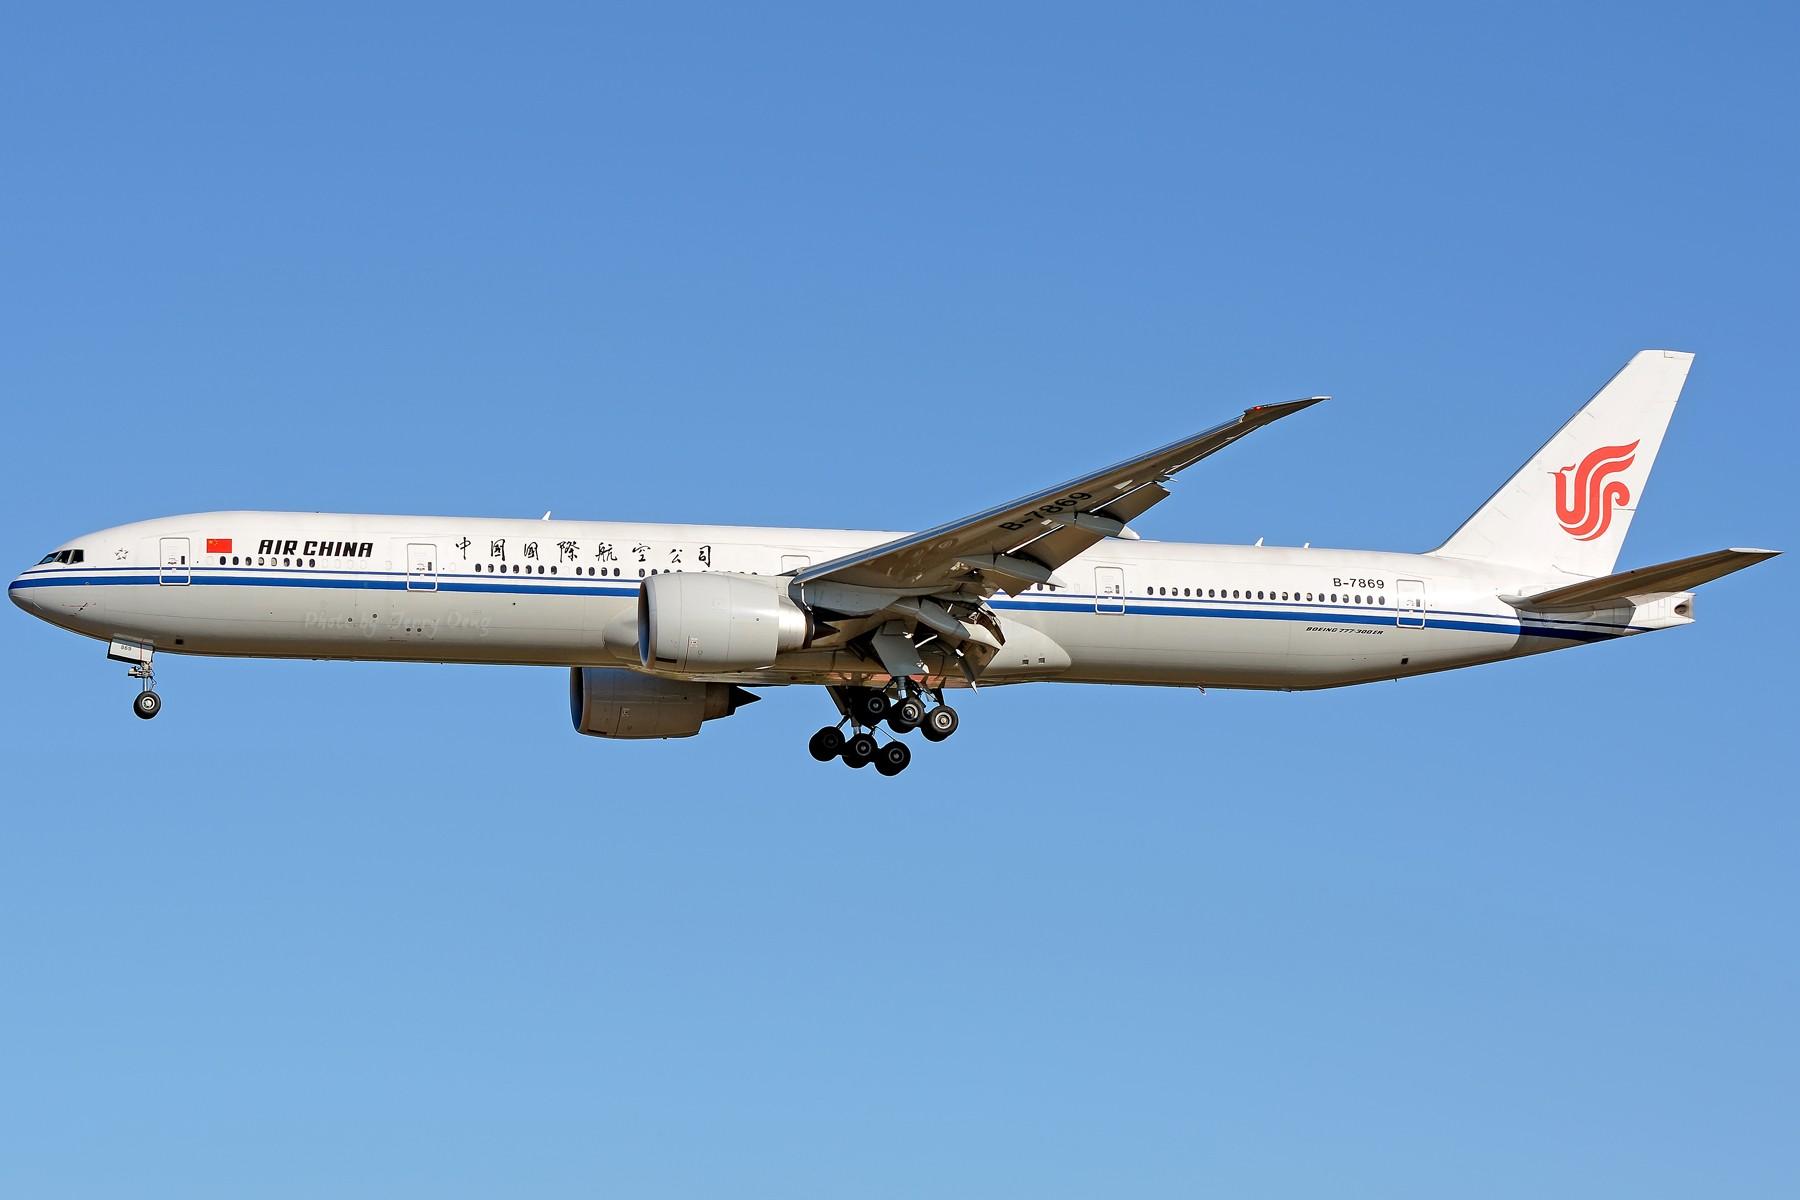 Re:[原创]【多图党】PEK落地一组国航系【2】 BOEING 777-300ER B-7869 中国北京首都国际机场